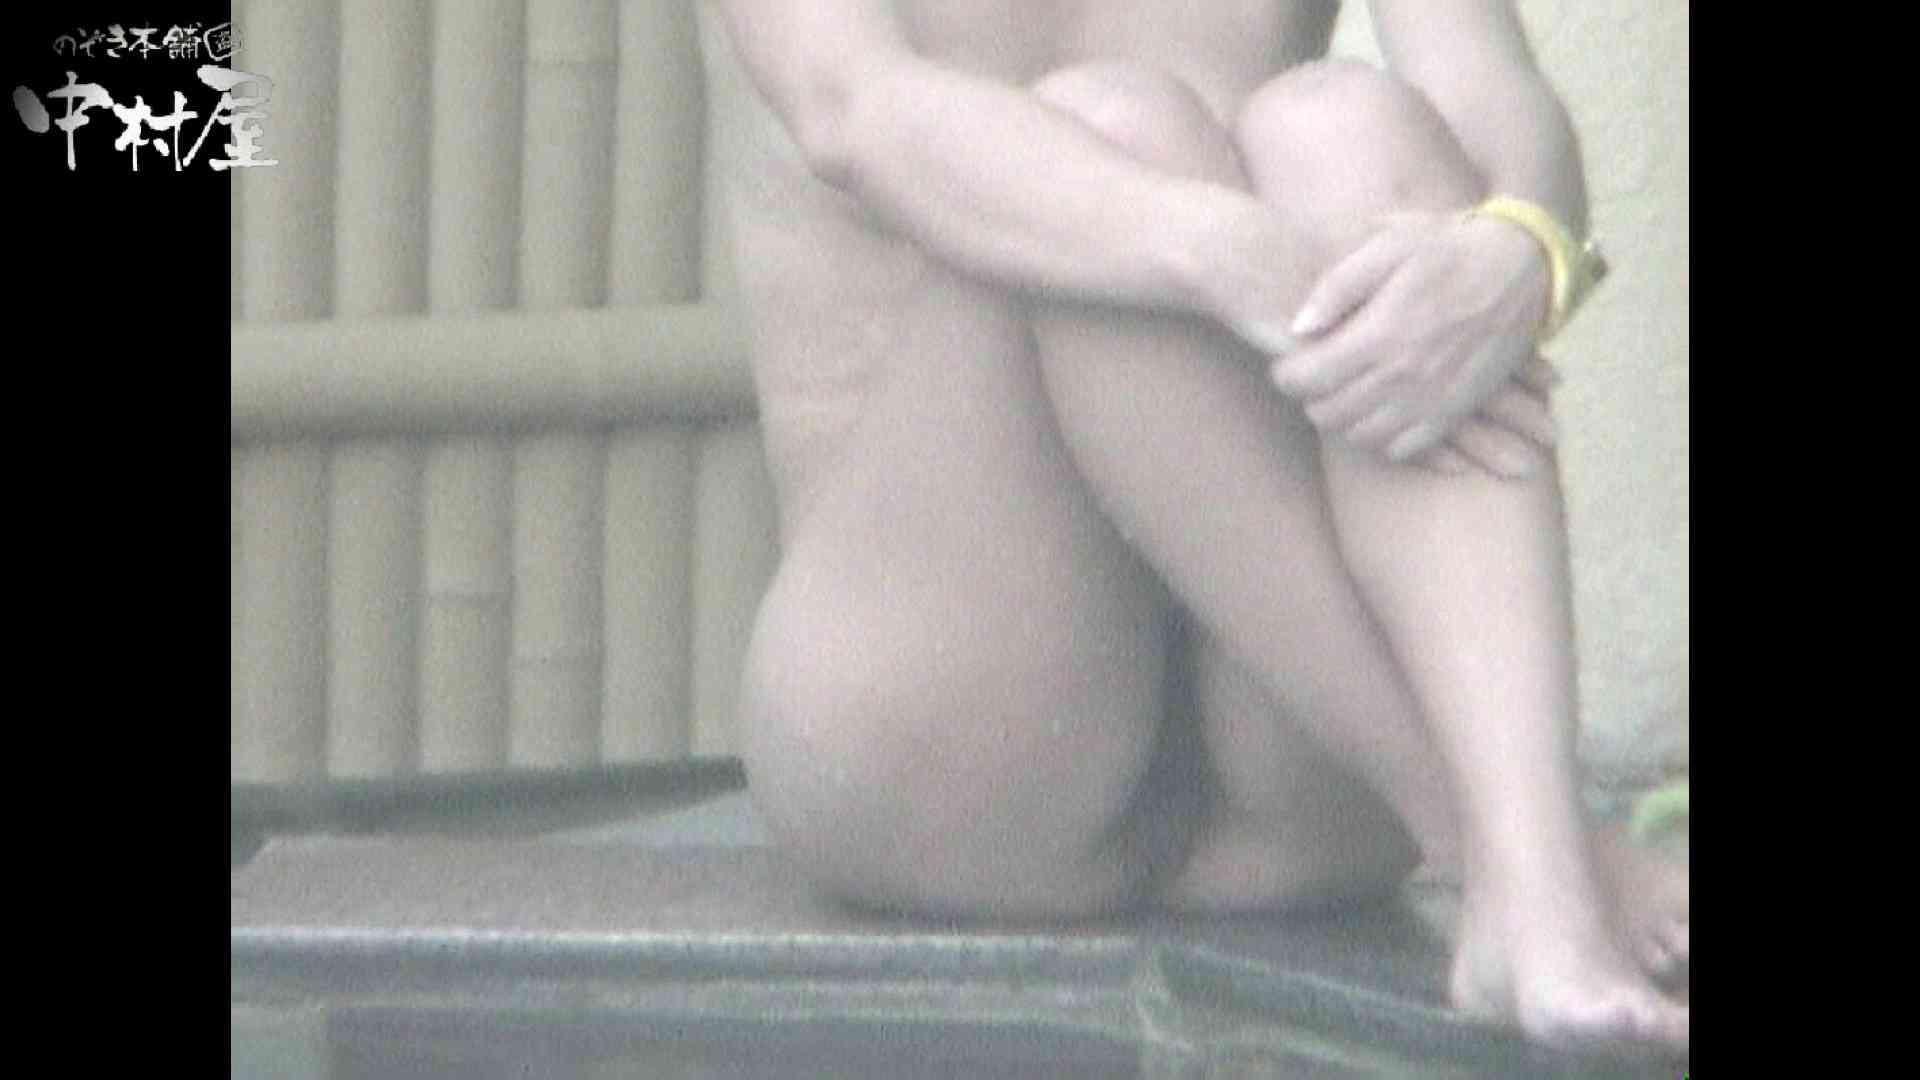 Aquaな露天風呂Vol.958 0  40連発 36